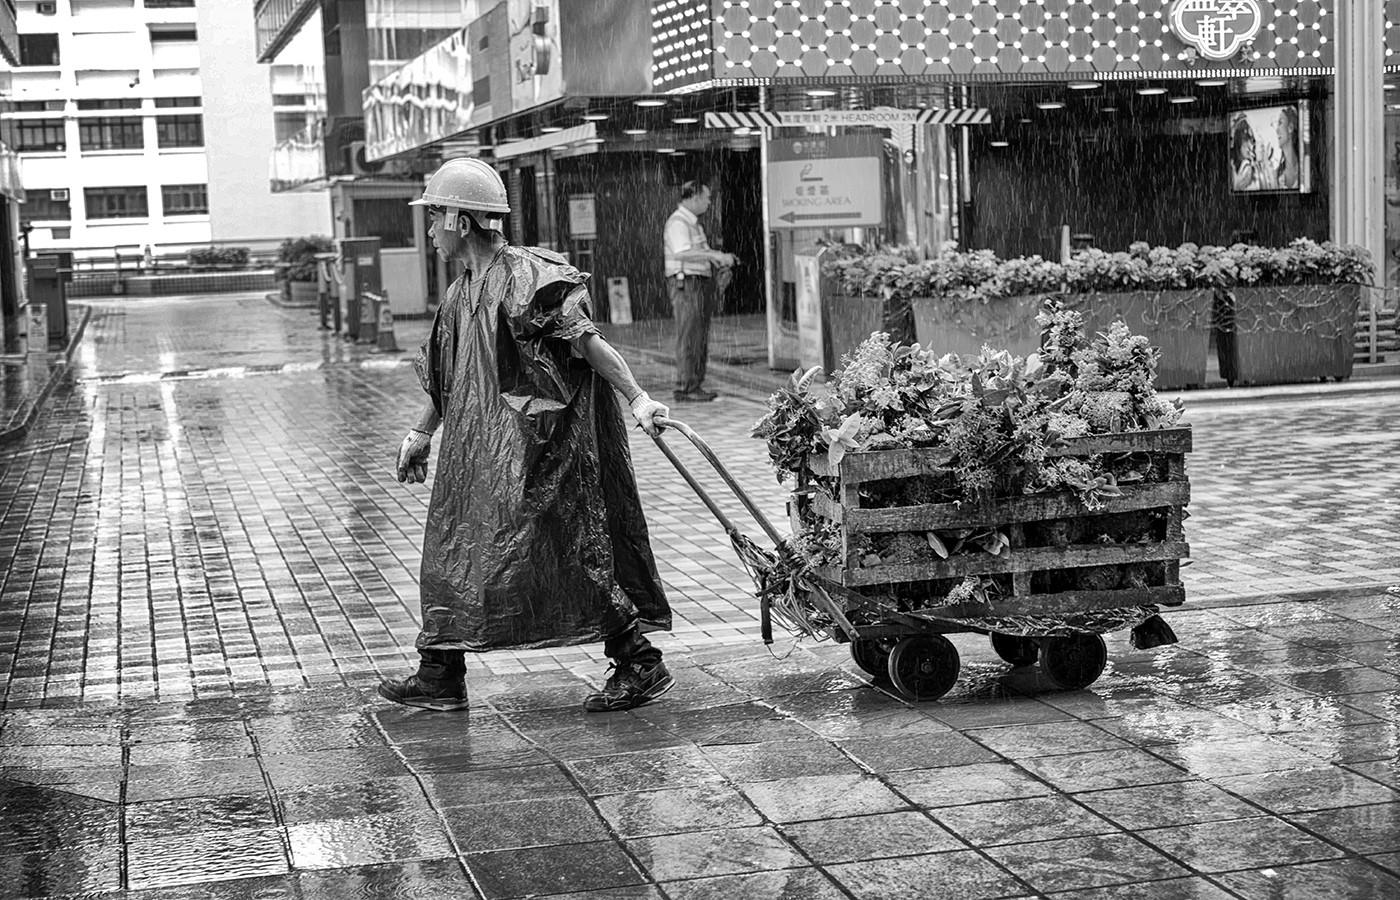 Margaret Kossowski - WORKING IN THE RAIN